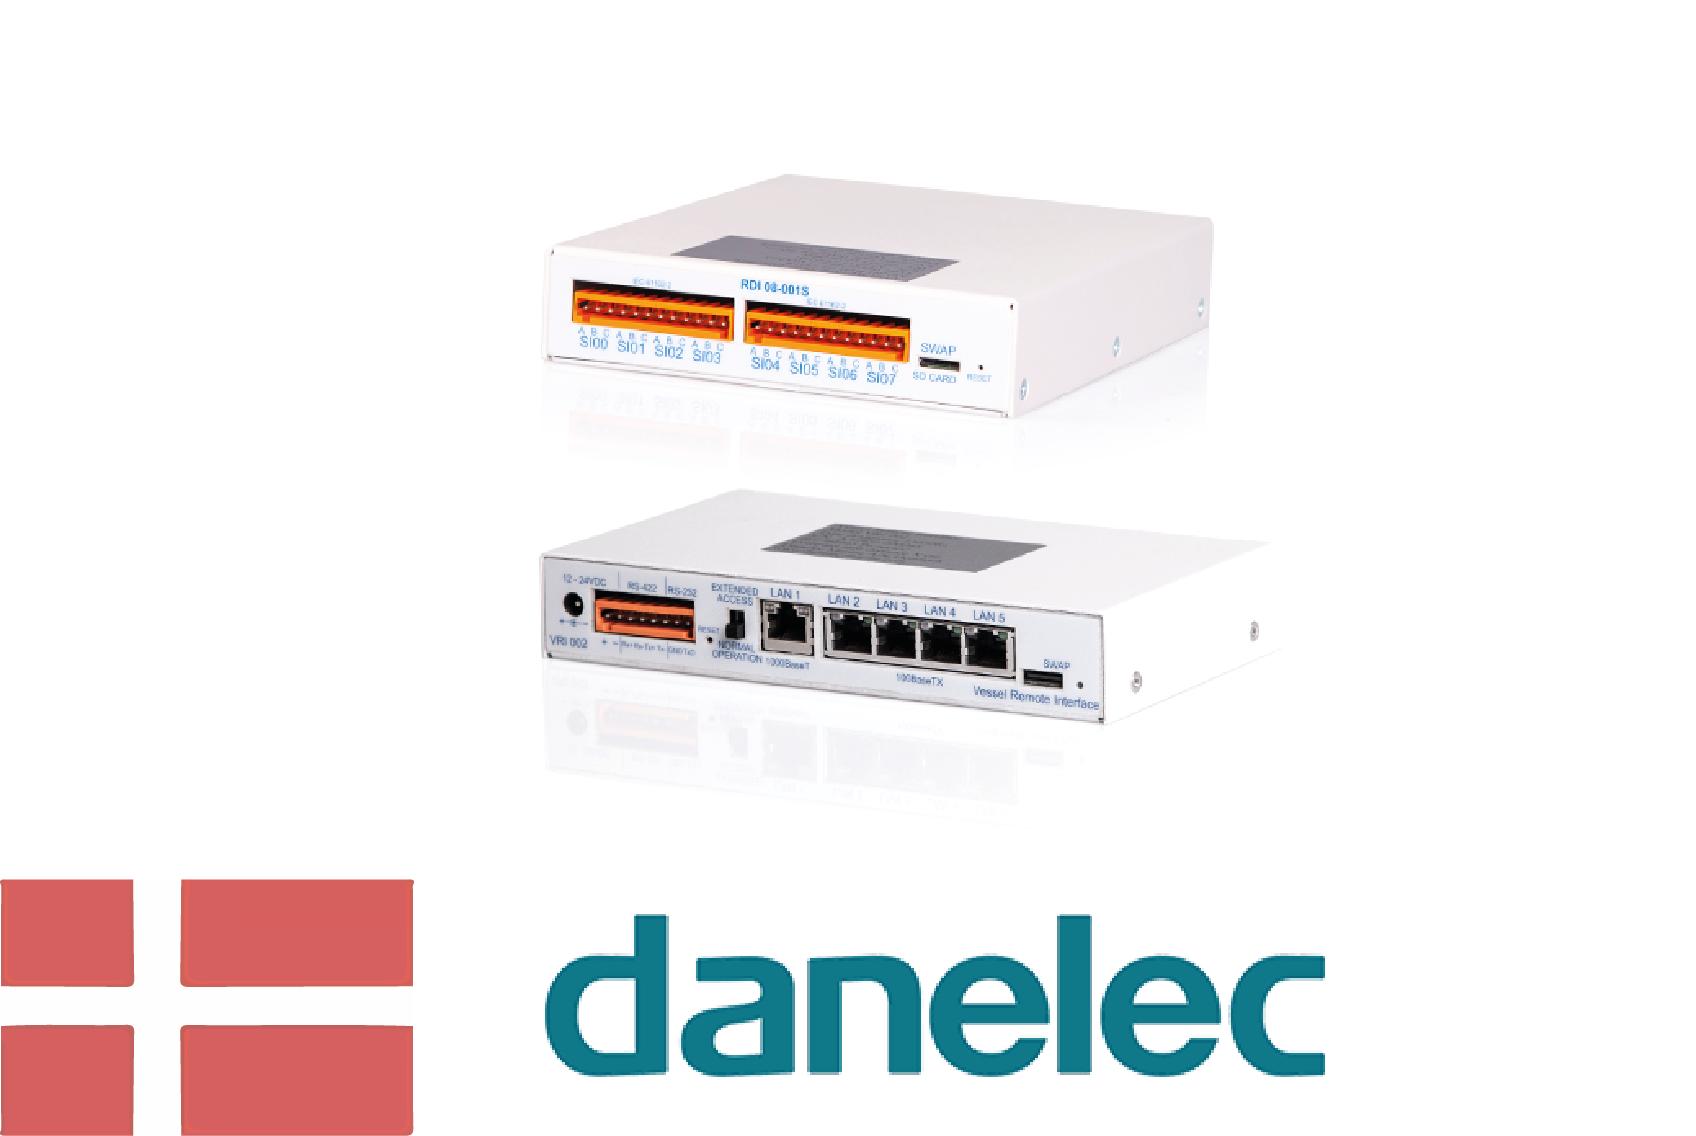 #6 Danelec - Circular electronics equipment - CIRCit Nord